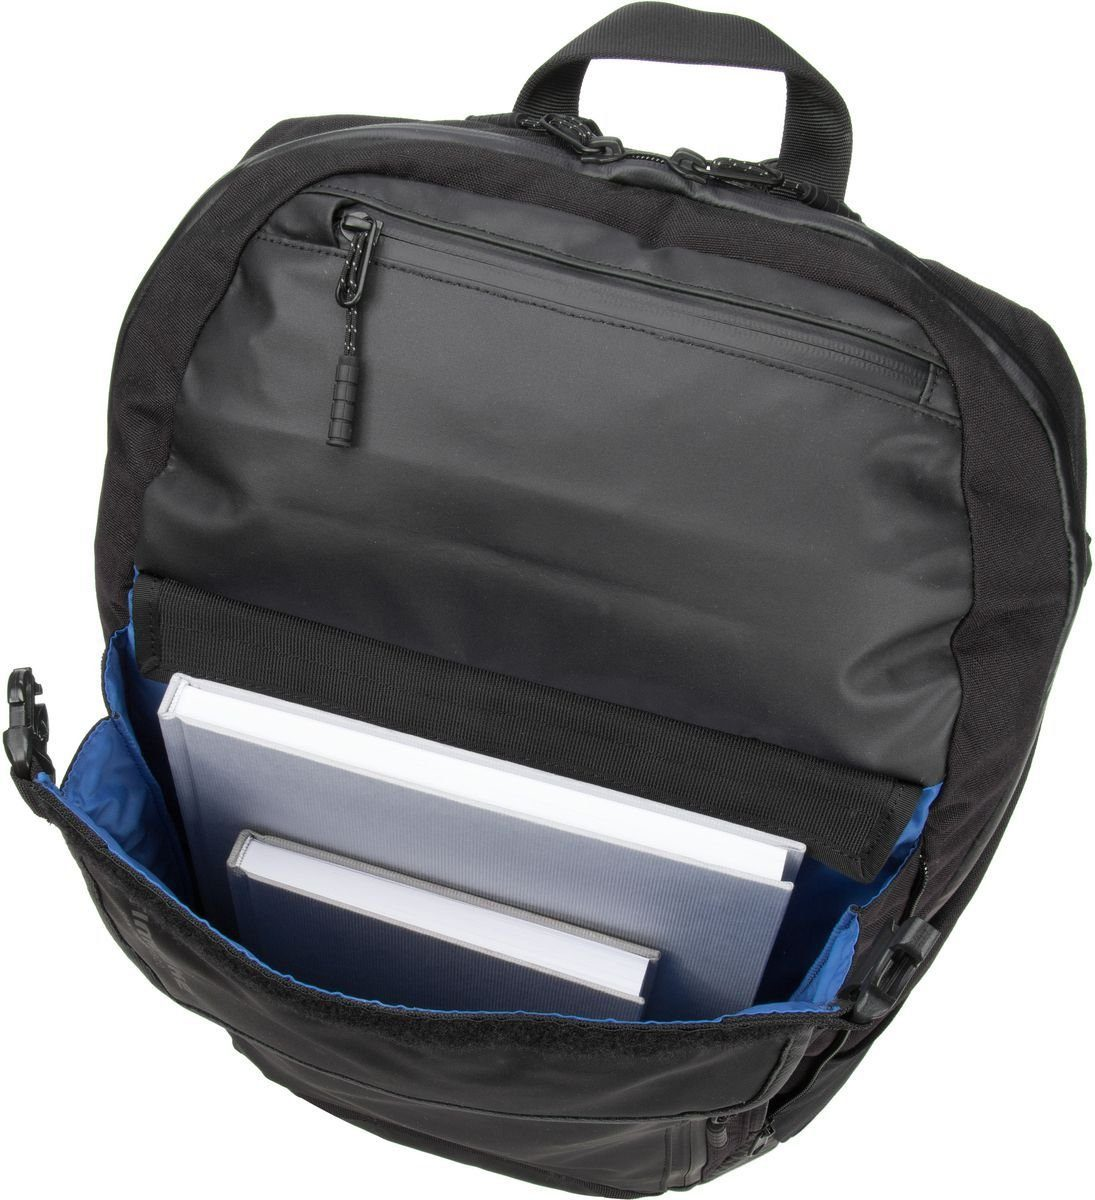 Backpack« Timbuk2 Medio Timbuk2 Laptoprucksack »especial »especial Laptoprucksack rFYFHqBw